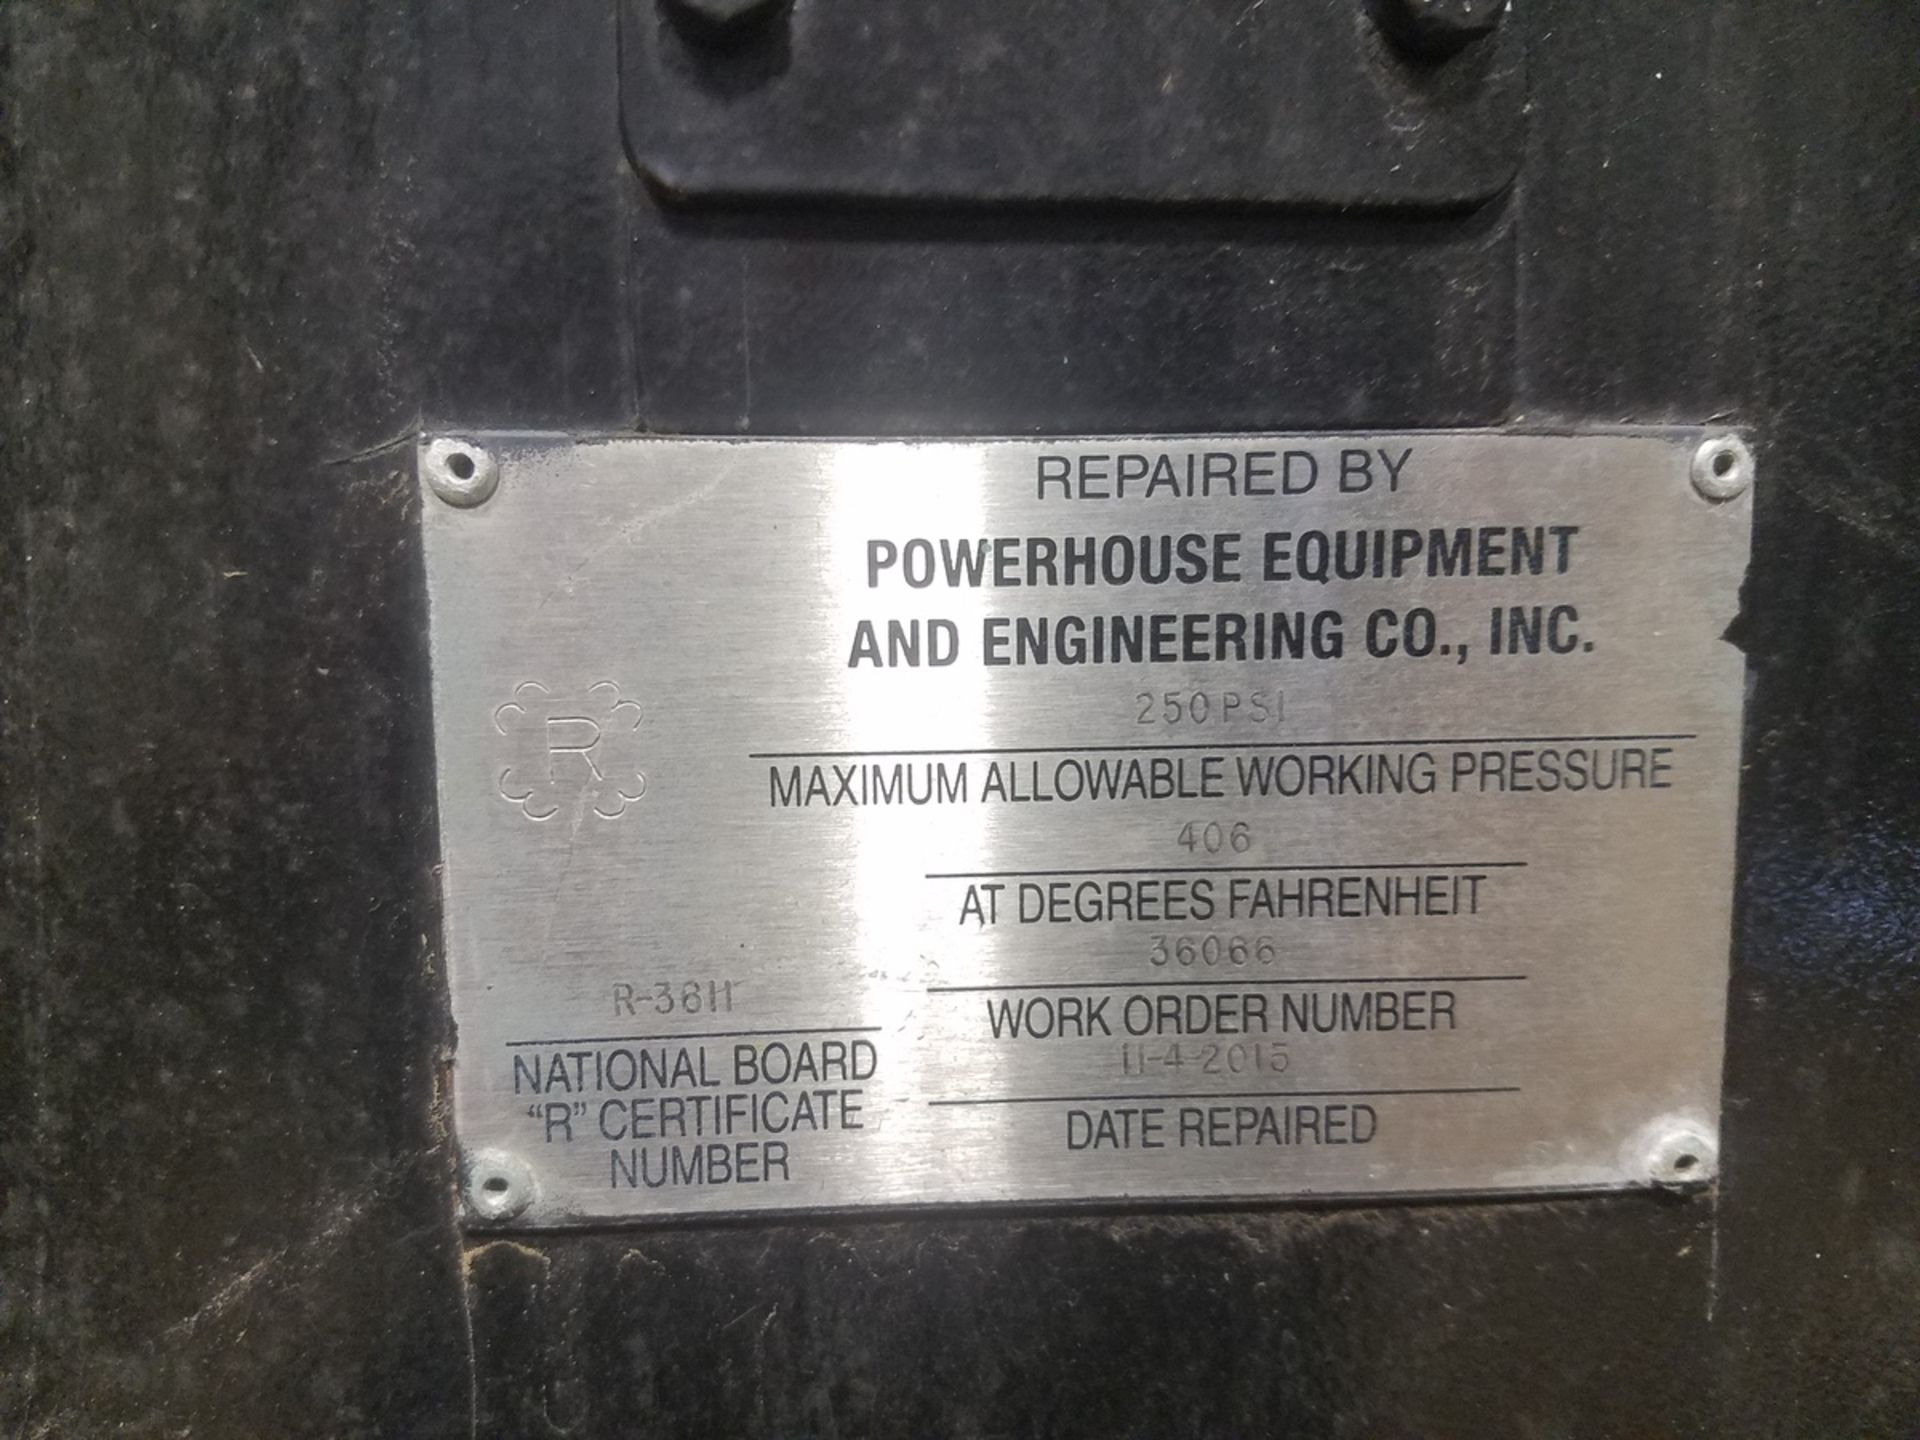 2009 (Rebuilt 2016) 250 HP Cleaver Brooks Boiler, 8.9 mmBTU, M# CB-200-250S-250, | Rig Fee: $5000 - Image 2 of 8